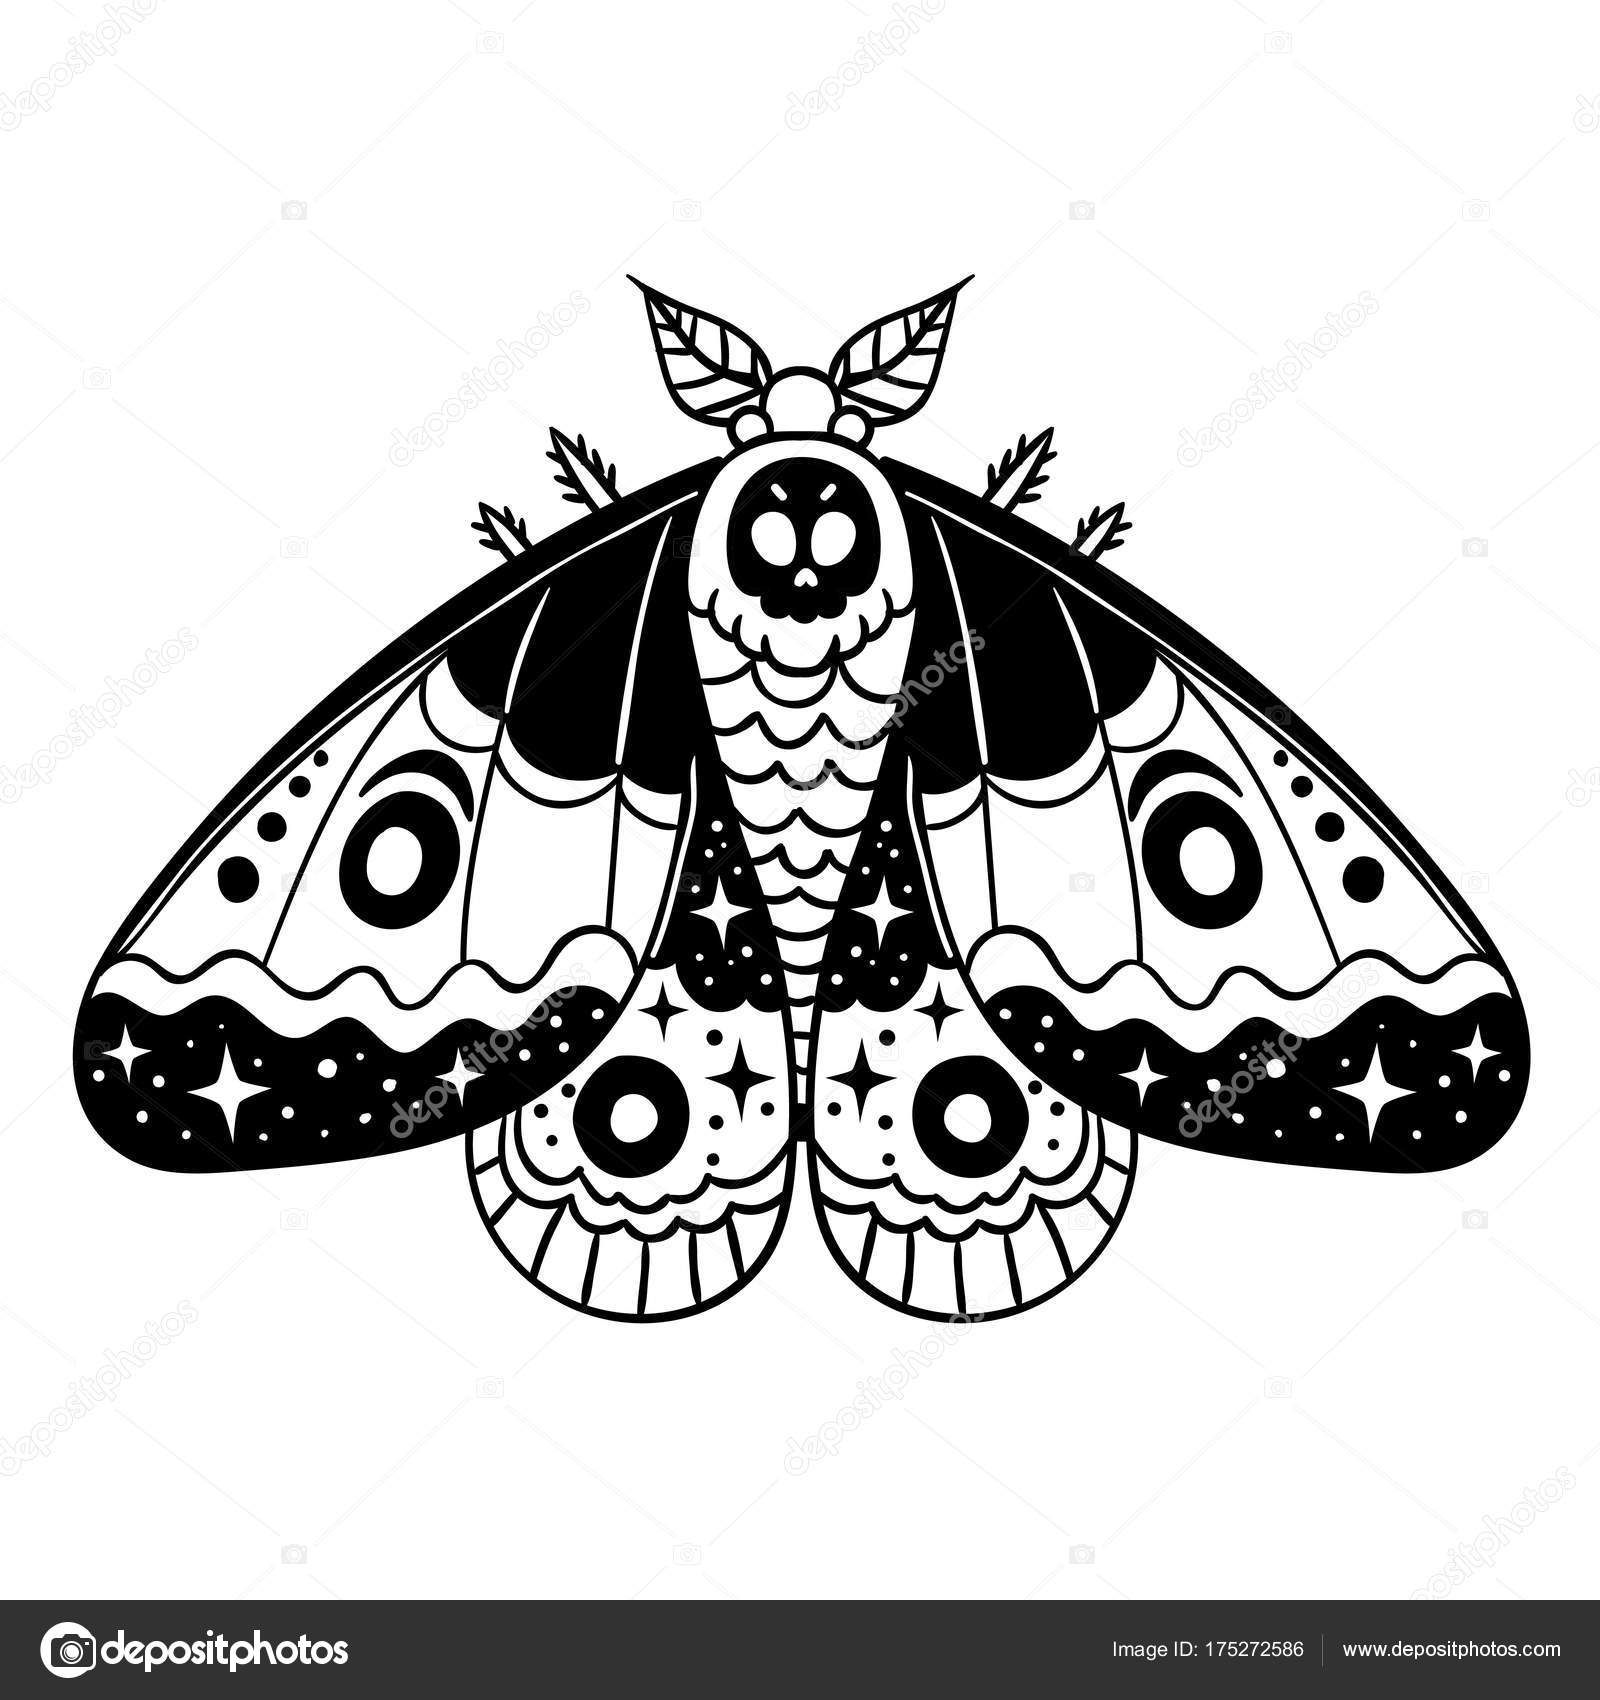 Vector Illustration Dessin Papillon Nuit Noir Blanc Dessin Anime